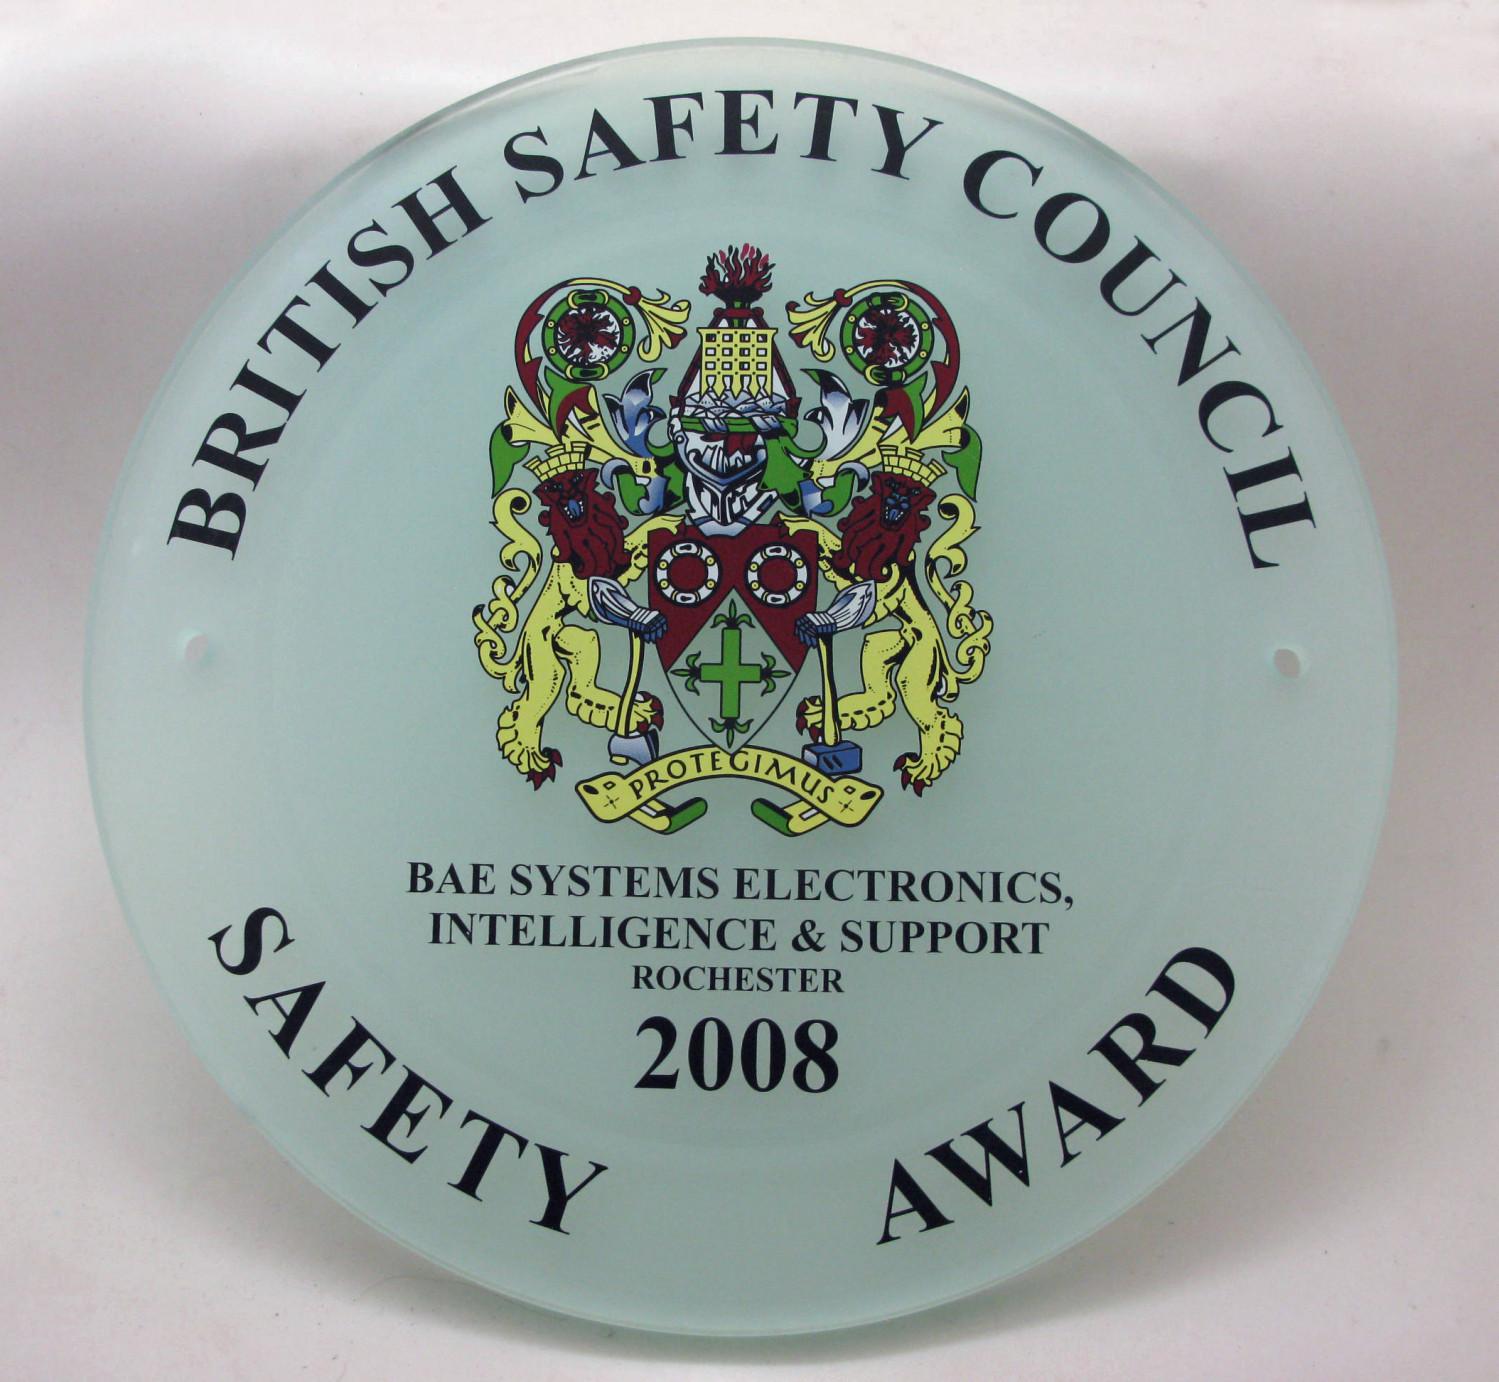 2008 Safety Award Plaque